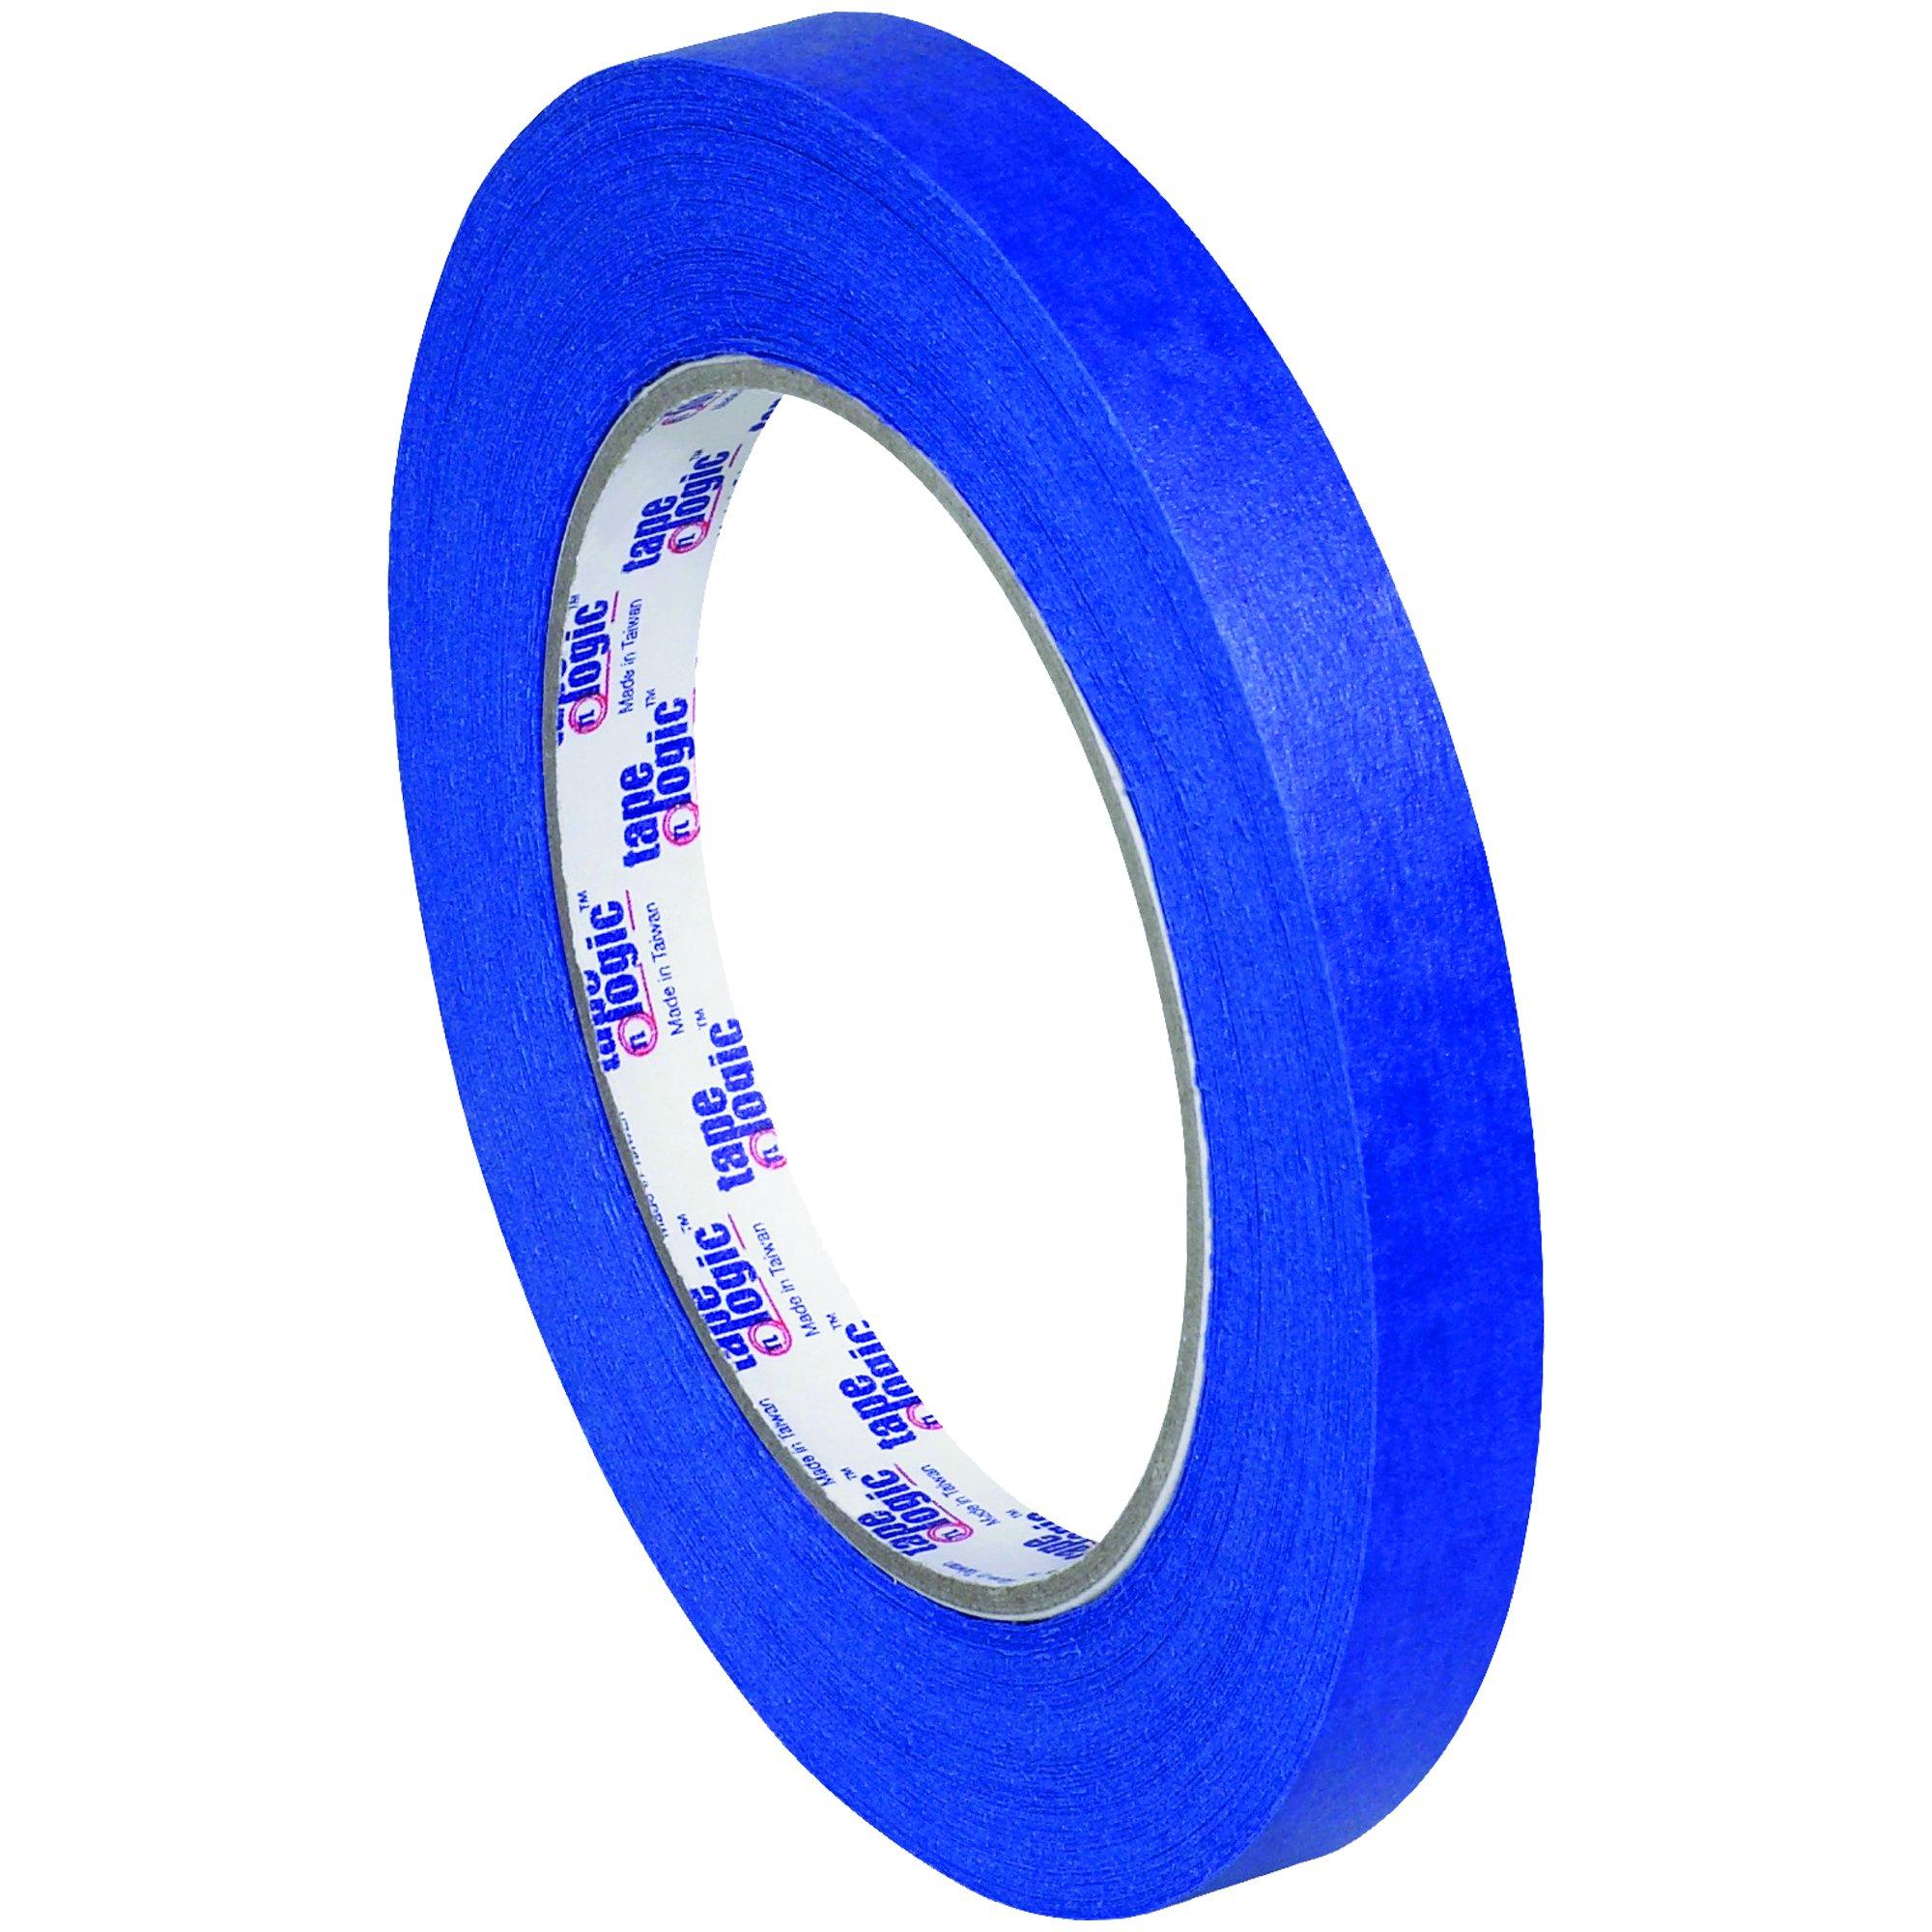 BOX USA BT9333000 Tape Logic 3000 Painter's Tape, 1/2'' x 60 yd., Blue (Pack of 72)